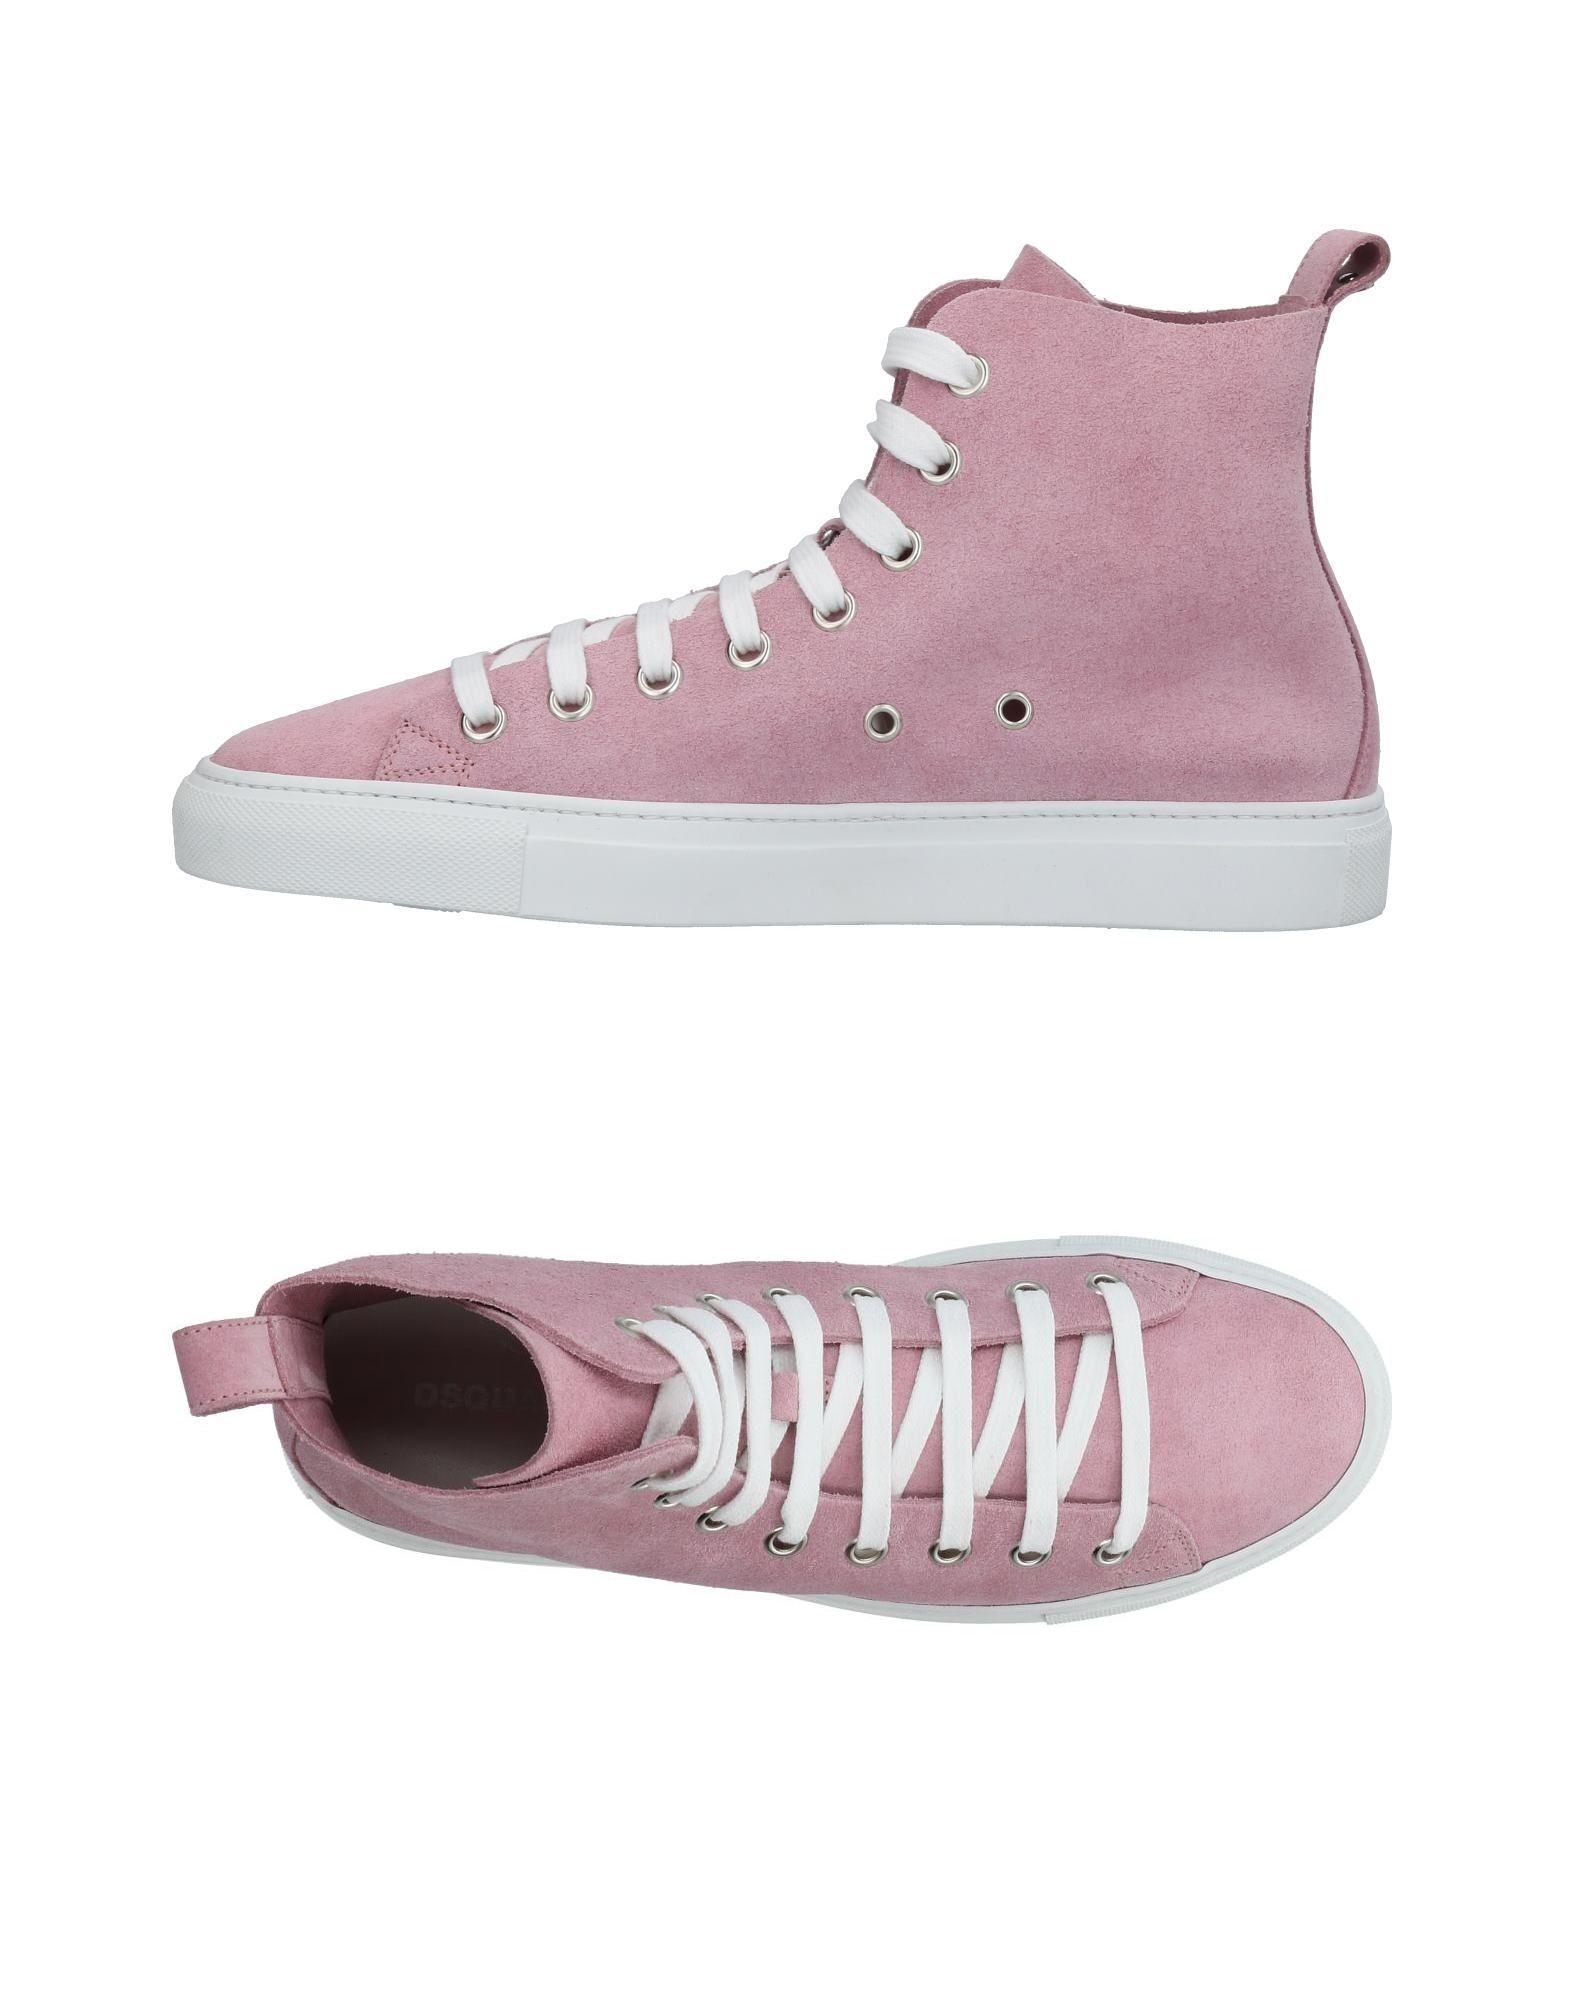 Dsquared2 Sneakers Herren  11441818UR Gute Qualität beliebte Schuhe